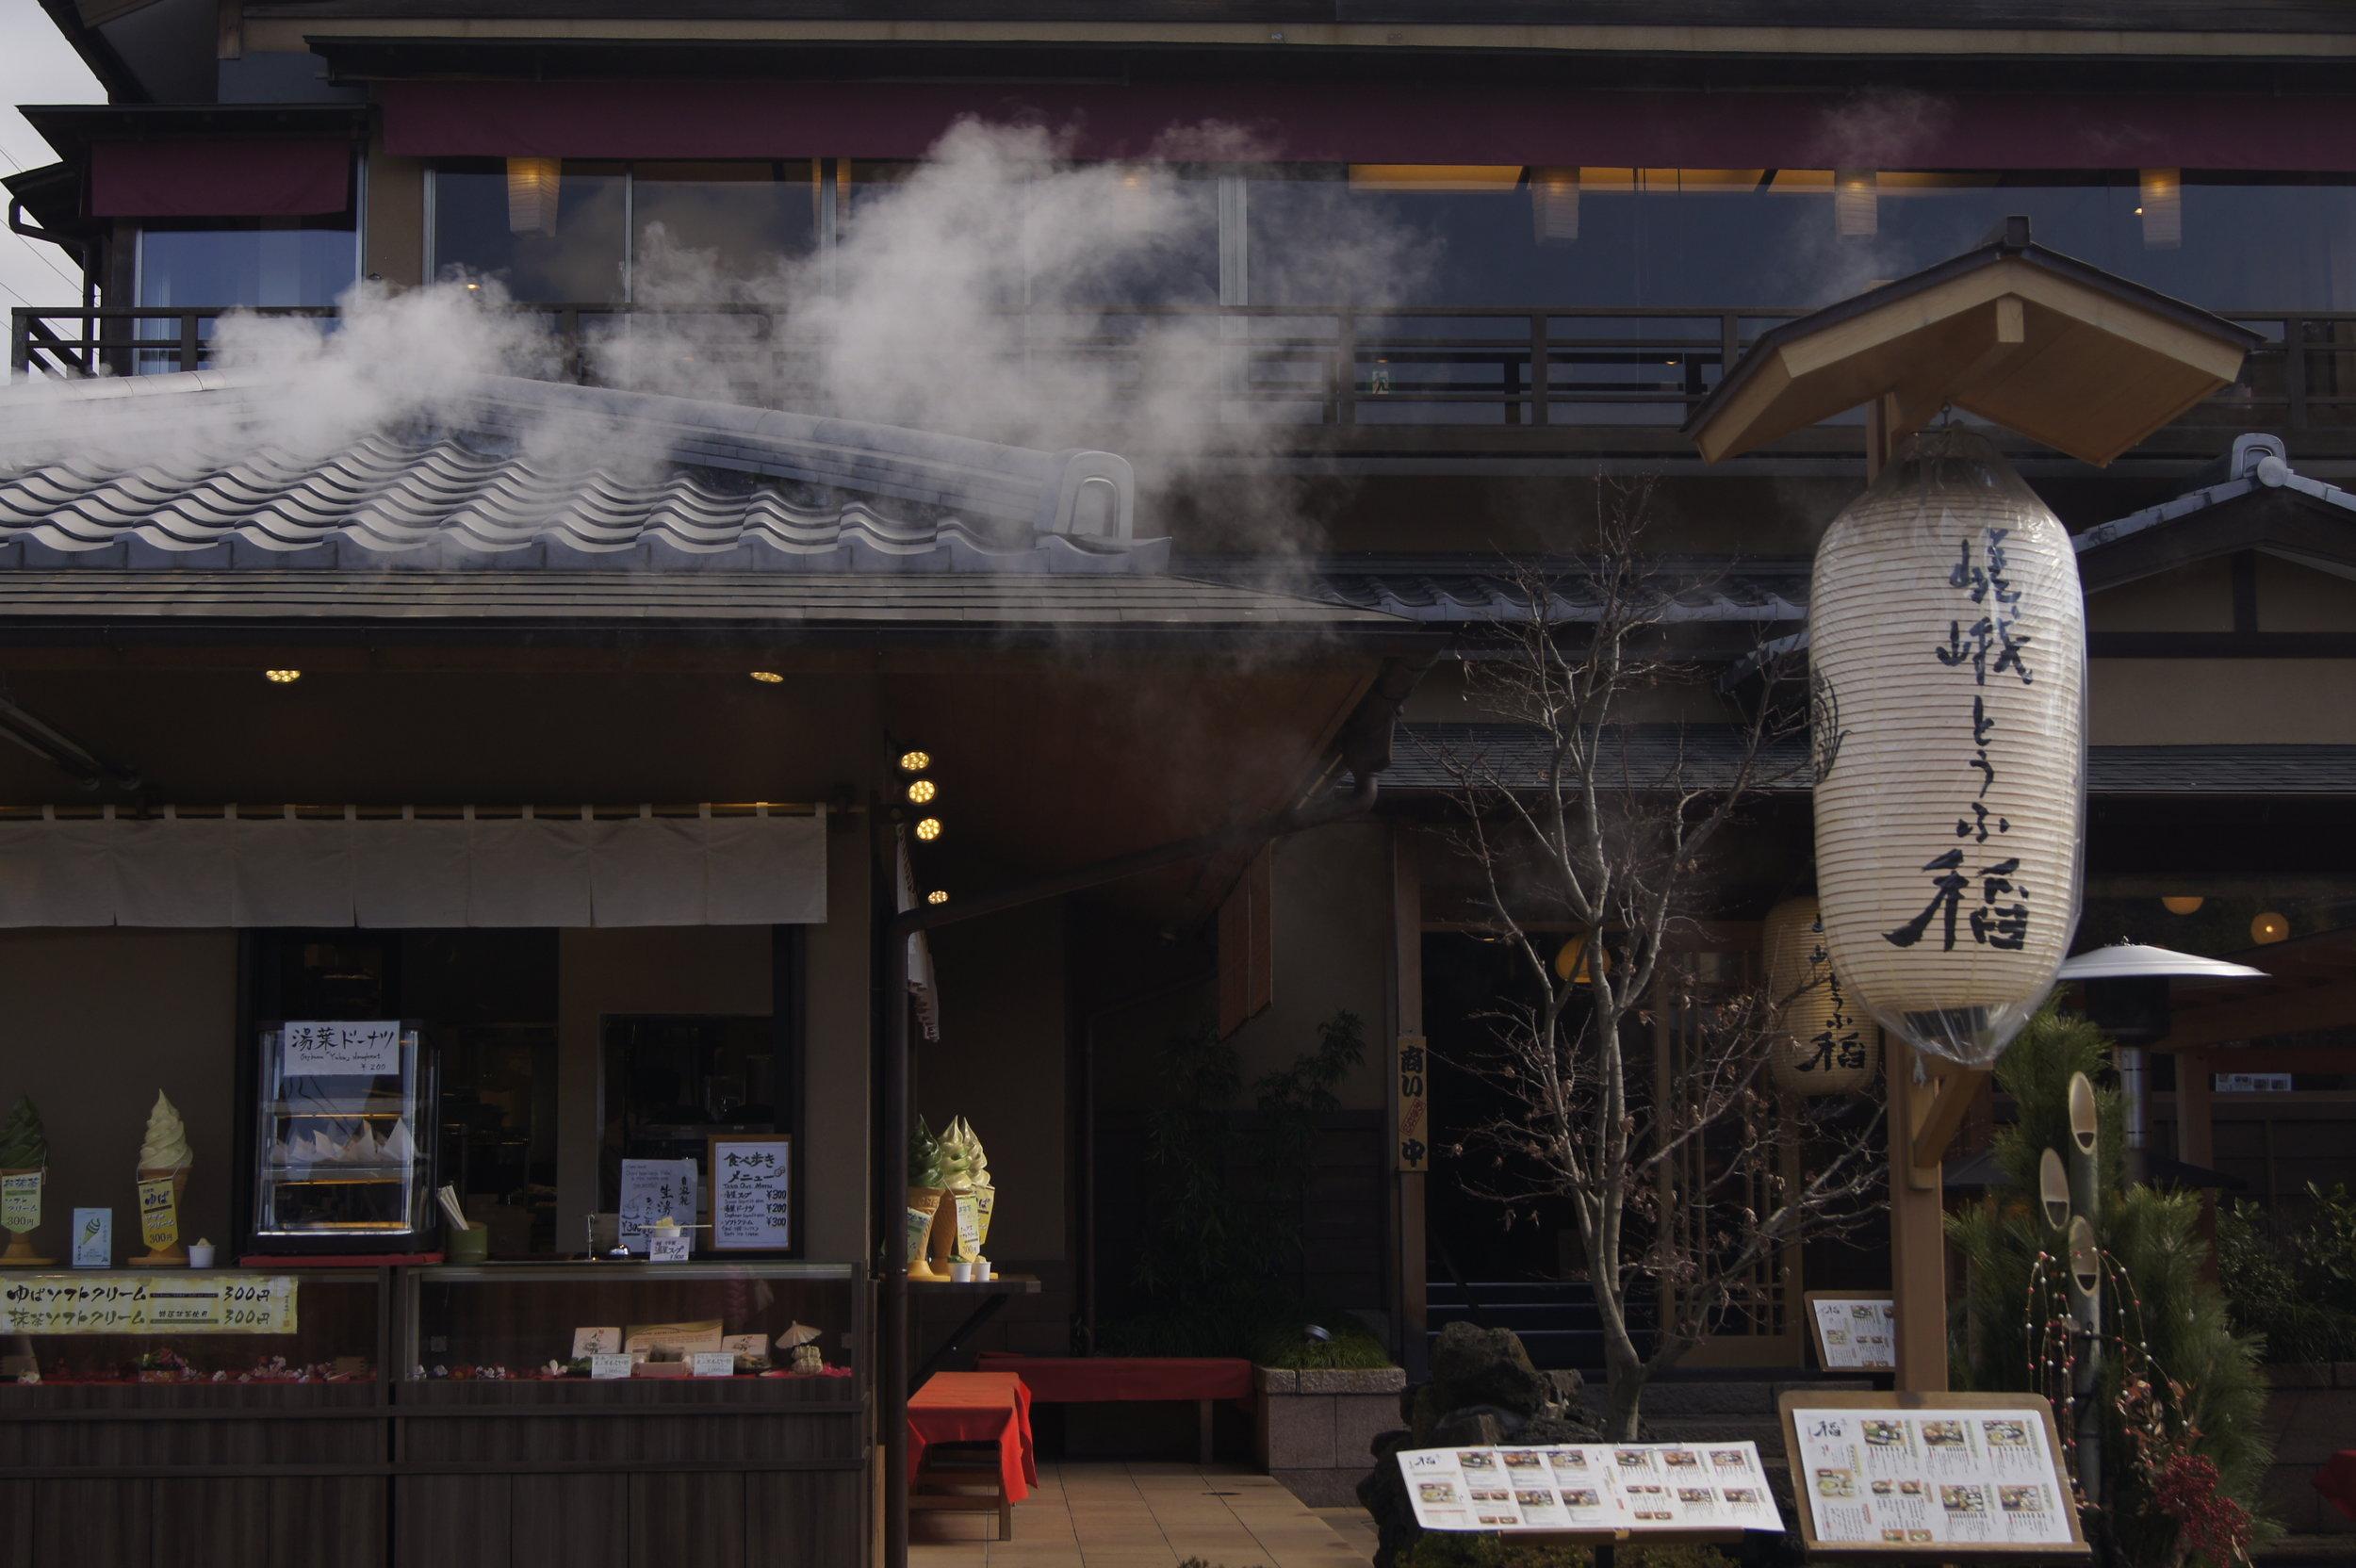 aRASHIYAMA, KYOTO, JAPAN                    PHOTOGRAPHY: @HILARYAGUILAR